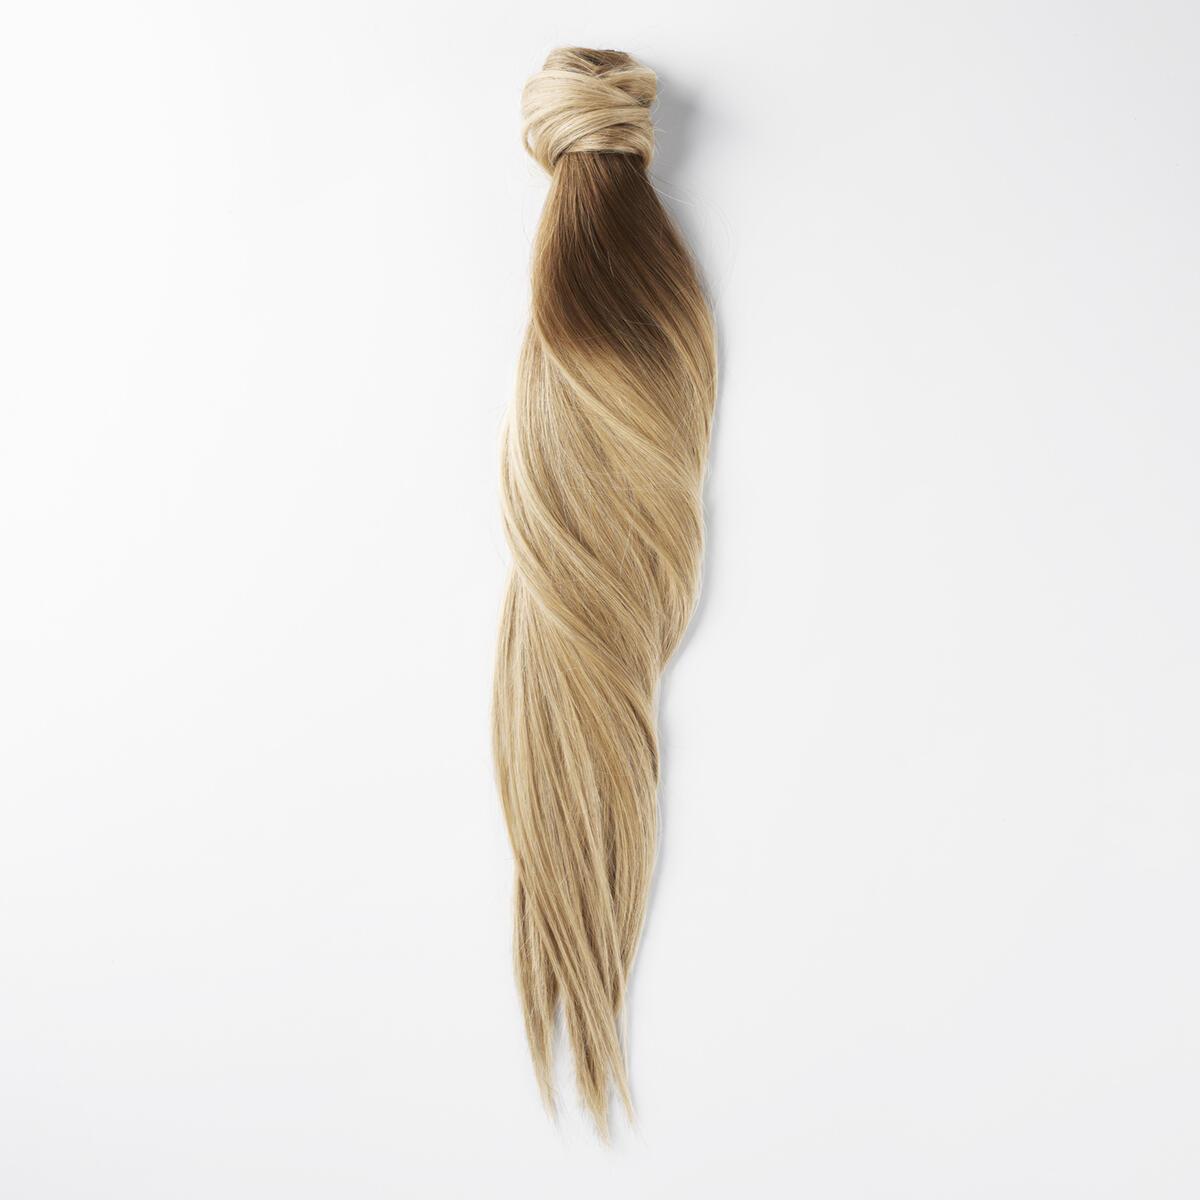 Clip-in Ponytail Original B5.4/7.2 Cinnamon Blonde Balayage 50 cm